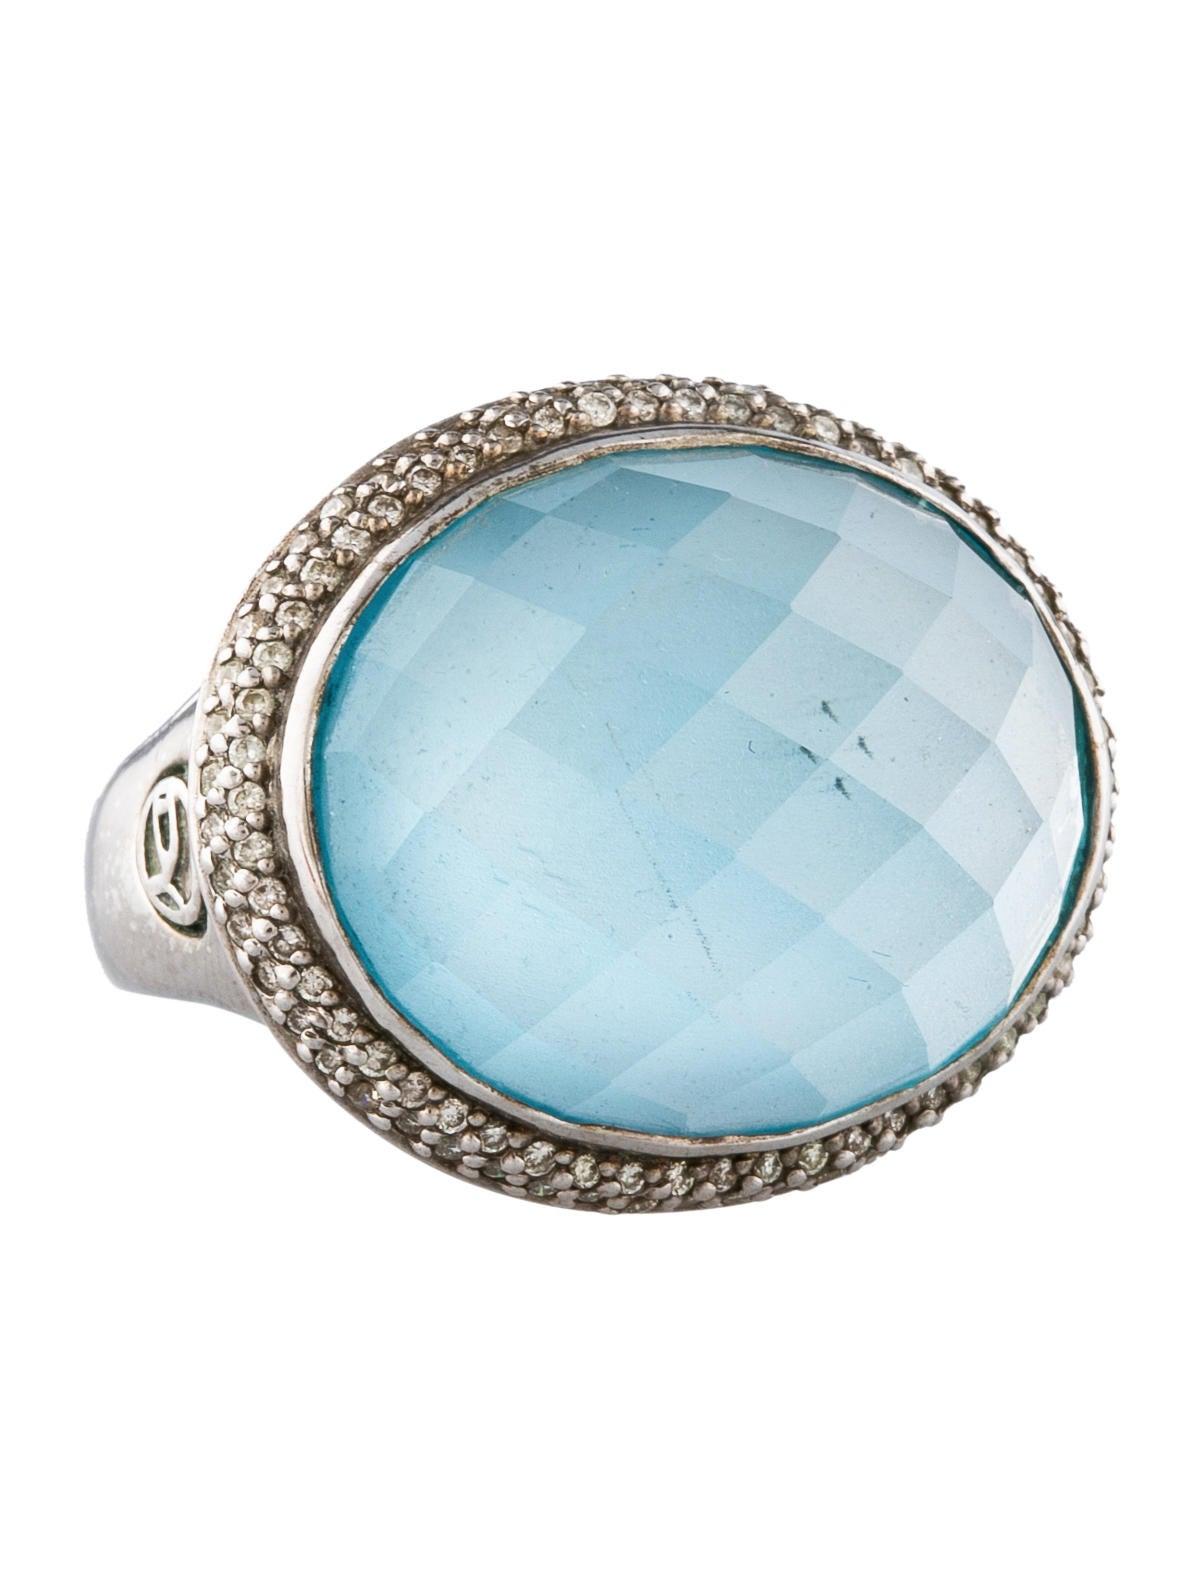 David yurman signature quartz and diamond ring rings for David yurman inspired jewelry rings